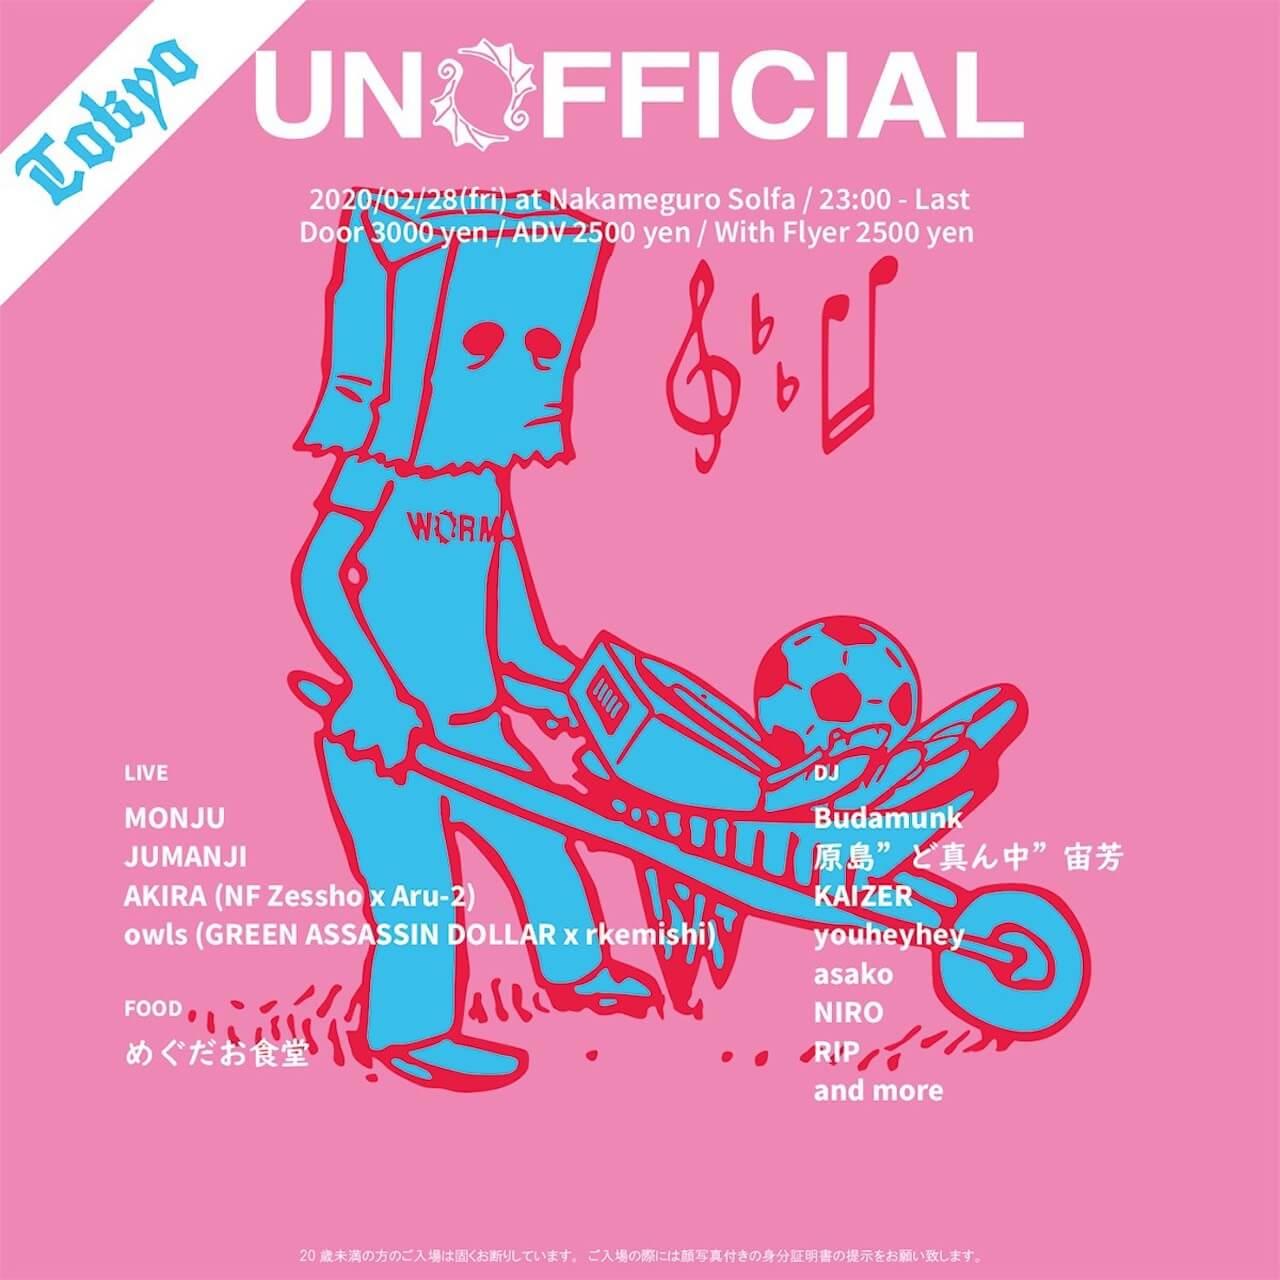 WORM TOKYO主宰「UNOFFICIAL」が東京・京都で開催|MONJU、Daichi Yamamoto、AKIRA、owls、Budamunk、NaBTokらが出演 music200216-wormtokyo-1